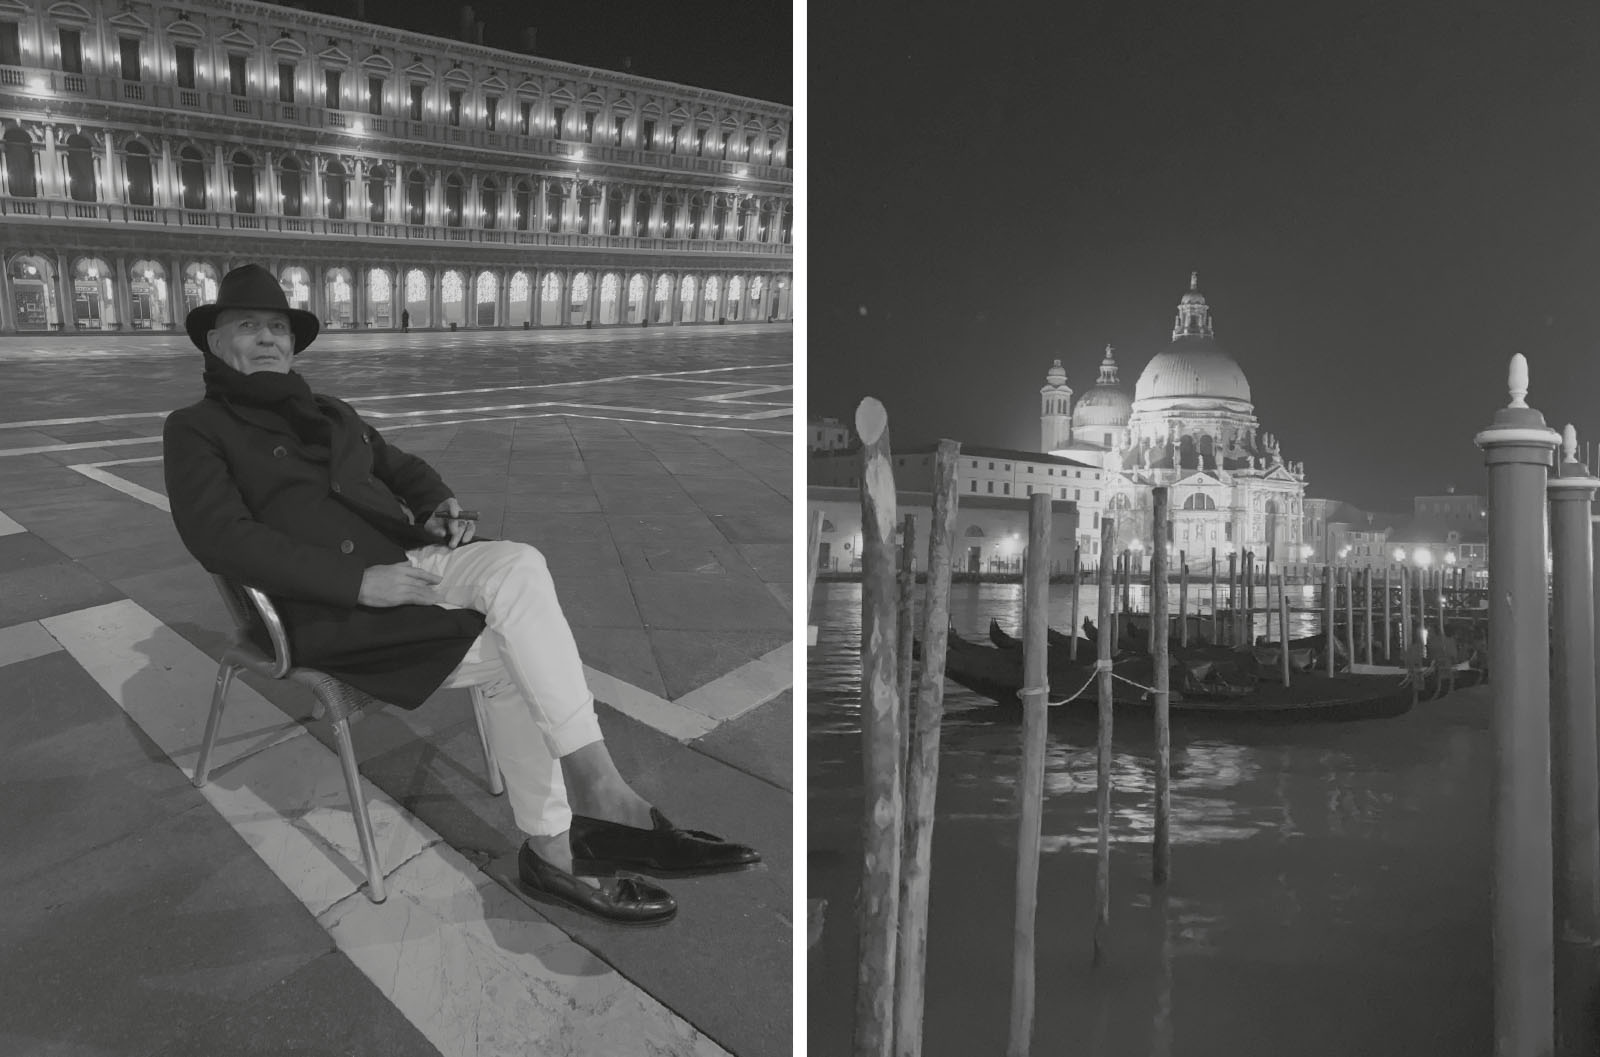 Alberto Del Biondi, Venezia